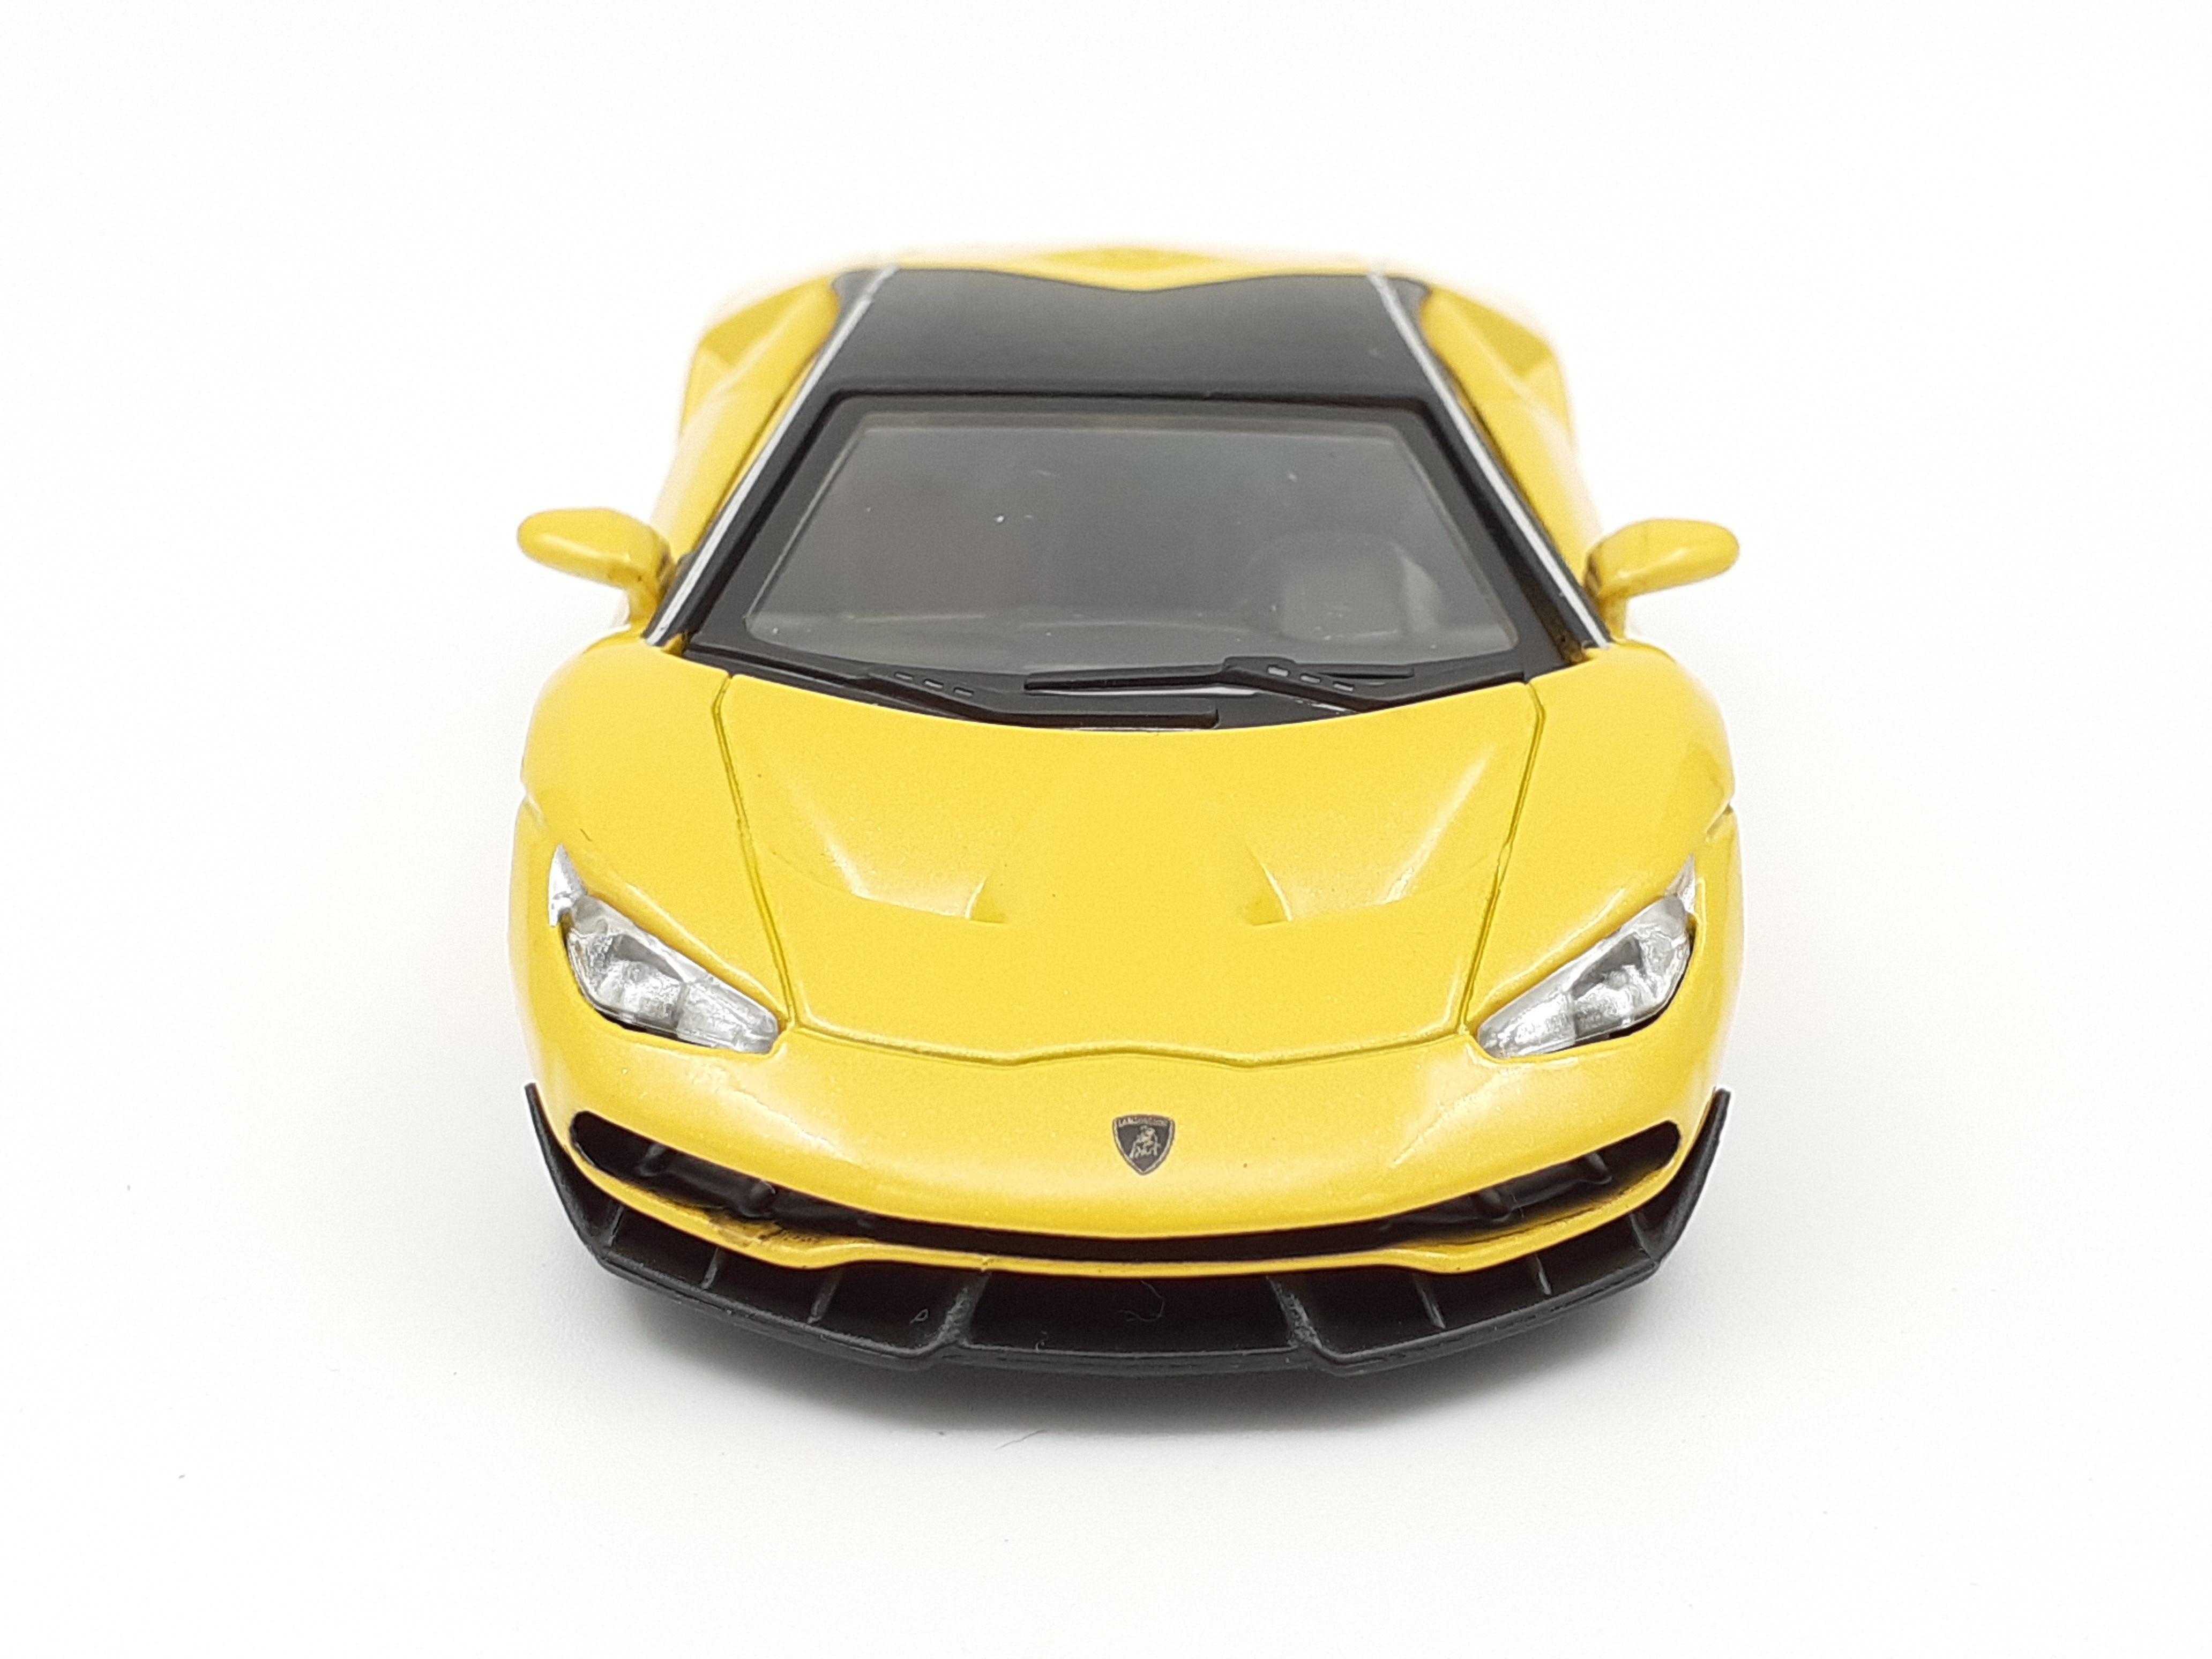 Maisto fresh metal Lamborghini Centenario žuti 1:43